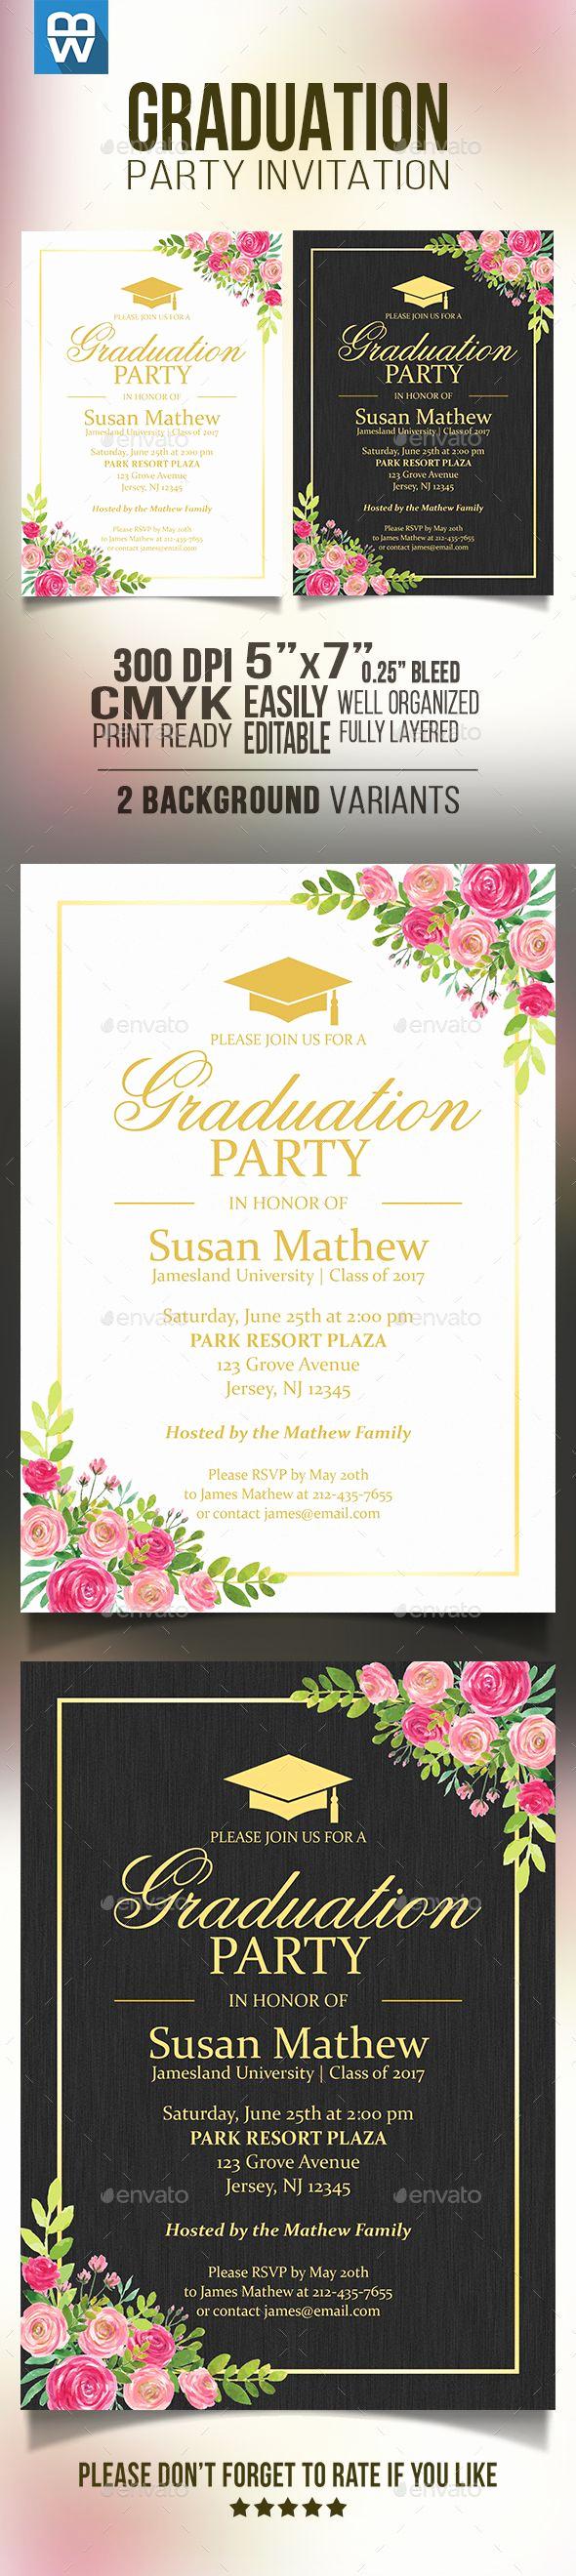 Graduation Reception Invitation Template Lovely 25 Unique Invitation Templates Ideas On Pinterest